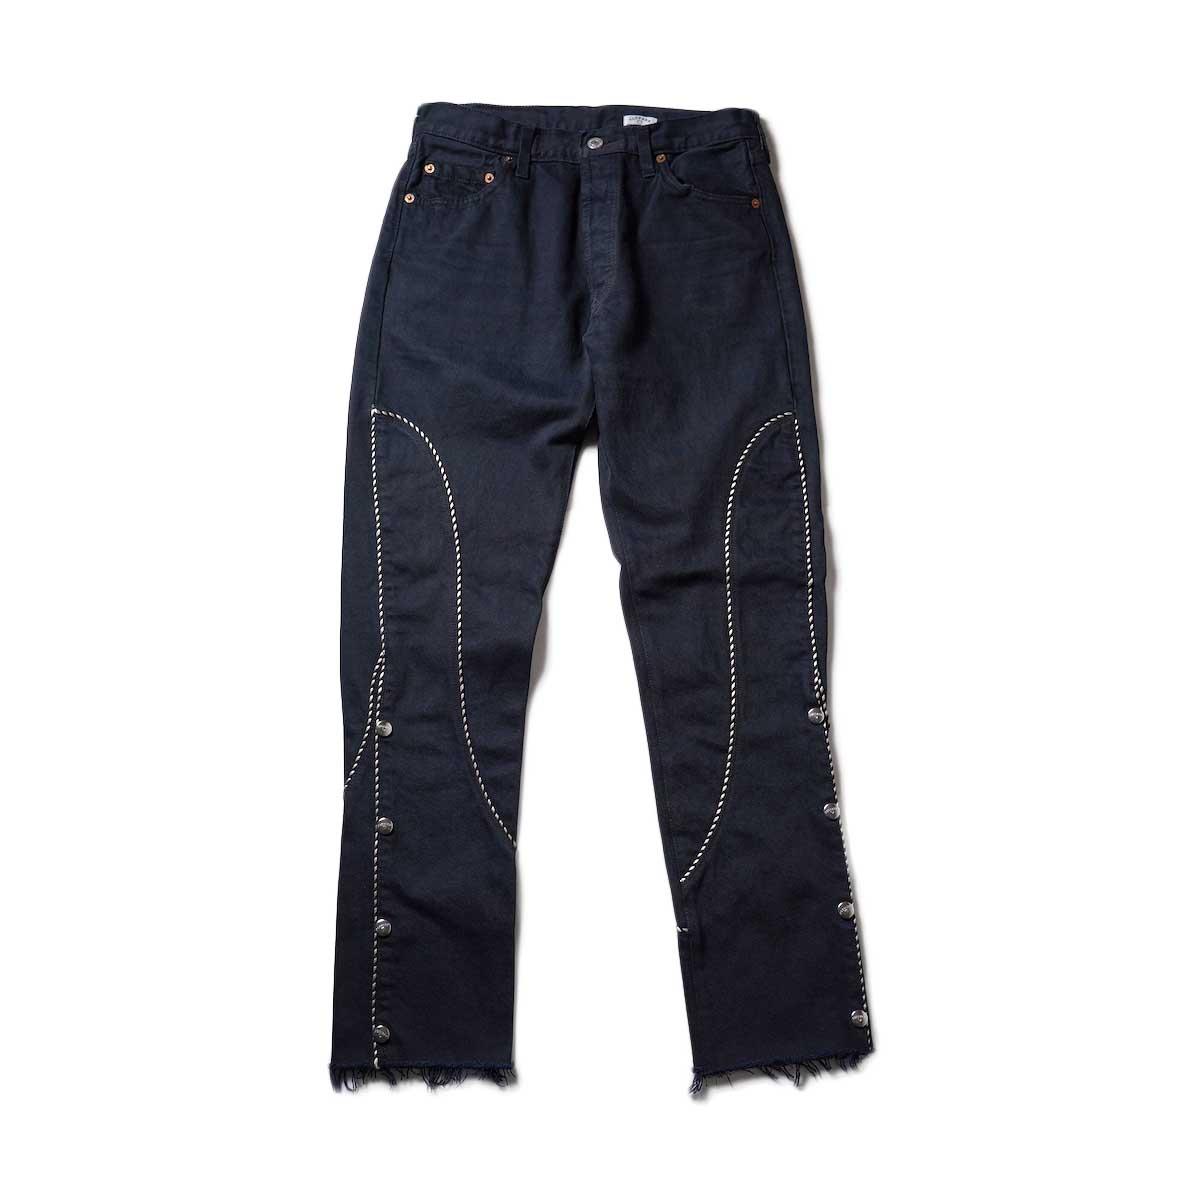 OLD PARK / Western Jeans2 Black (Ssize-A)